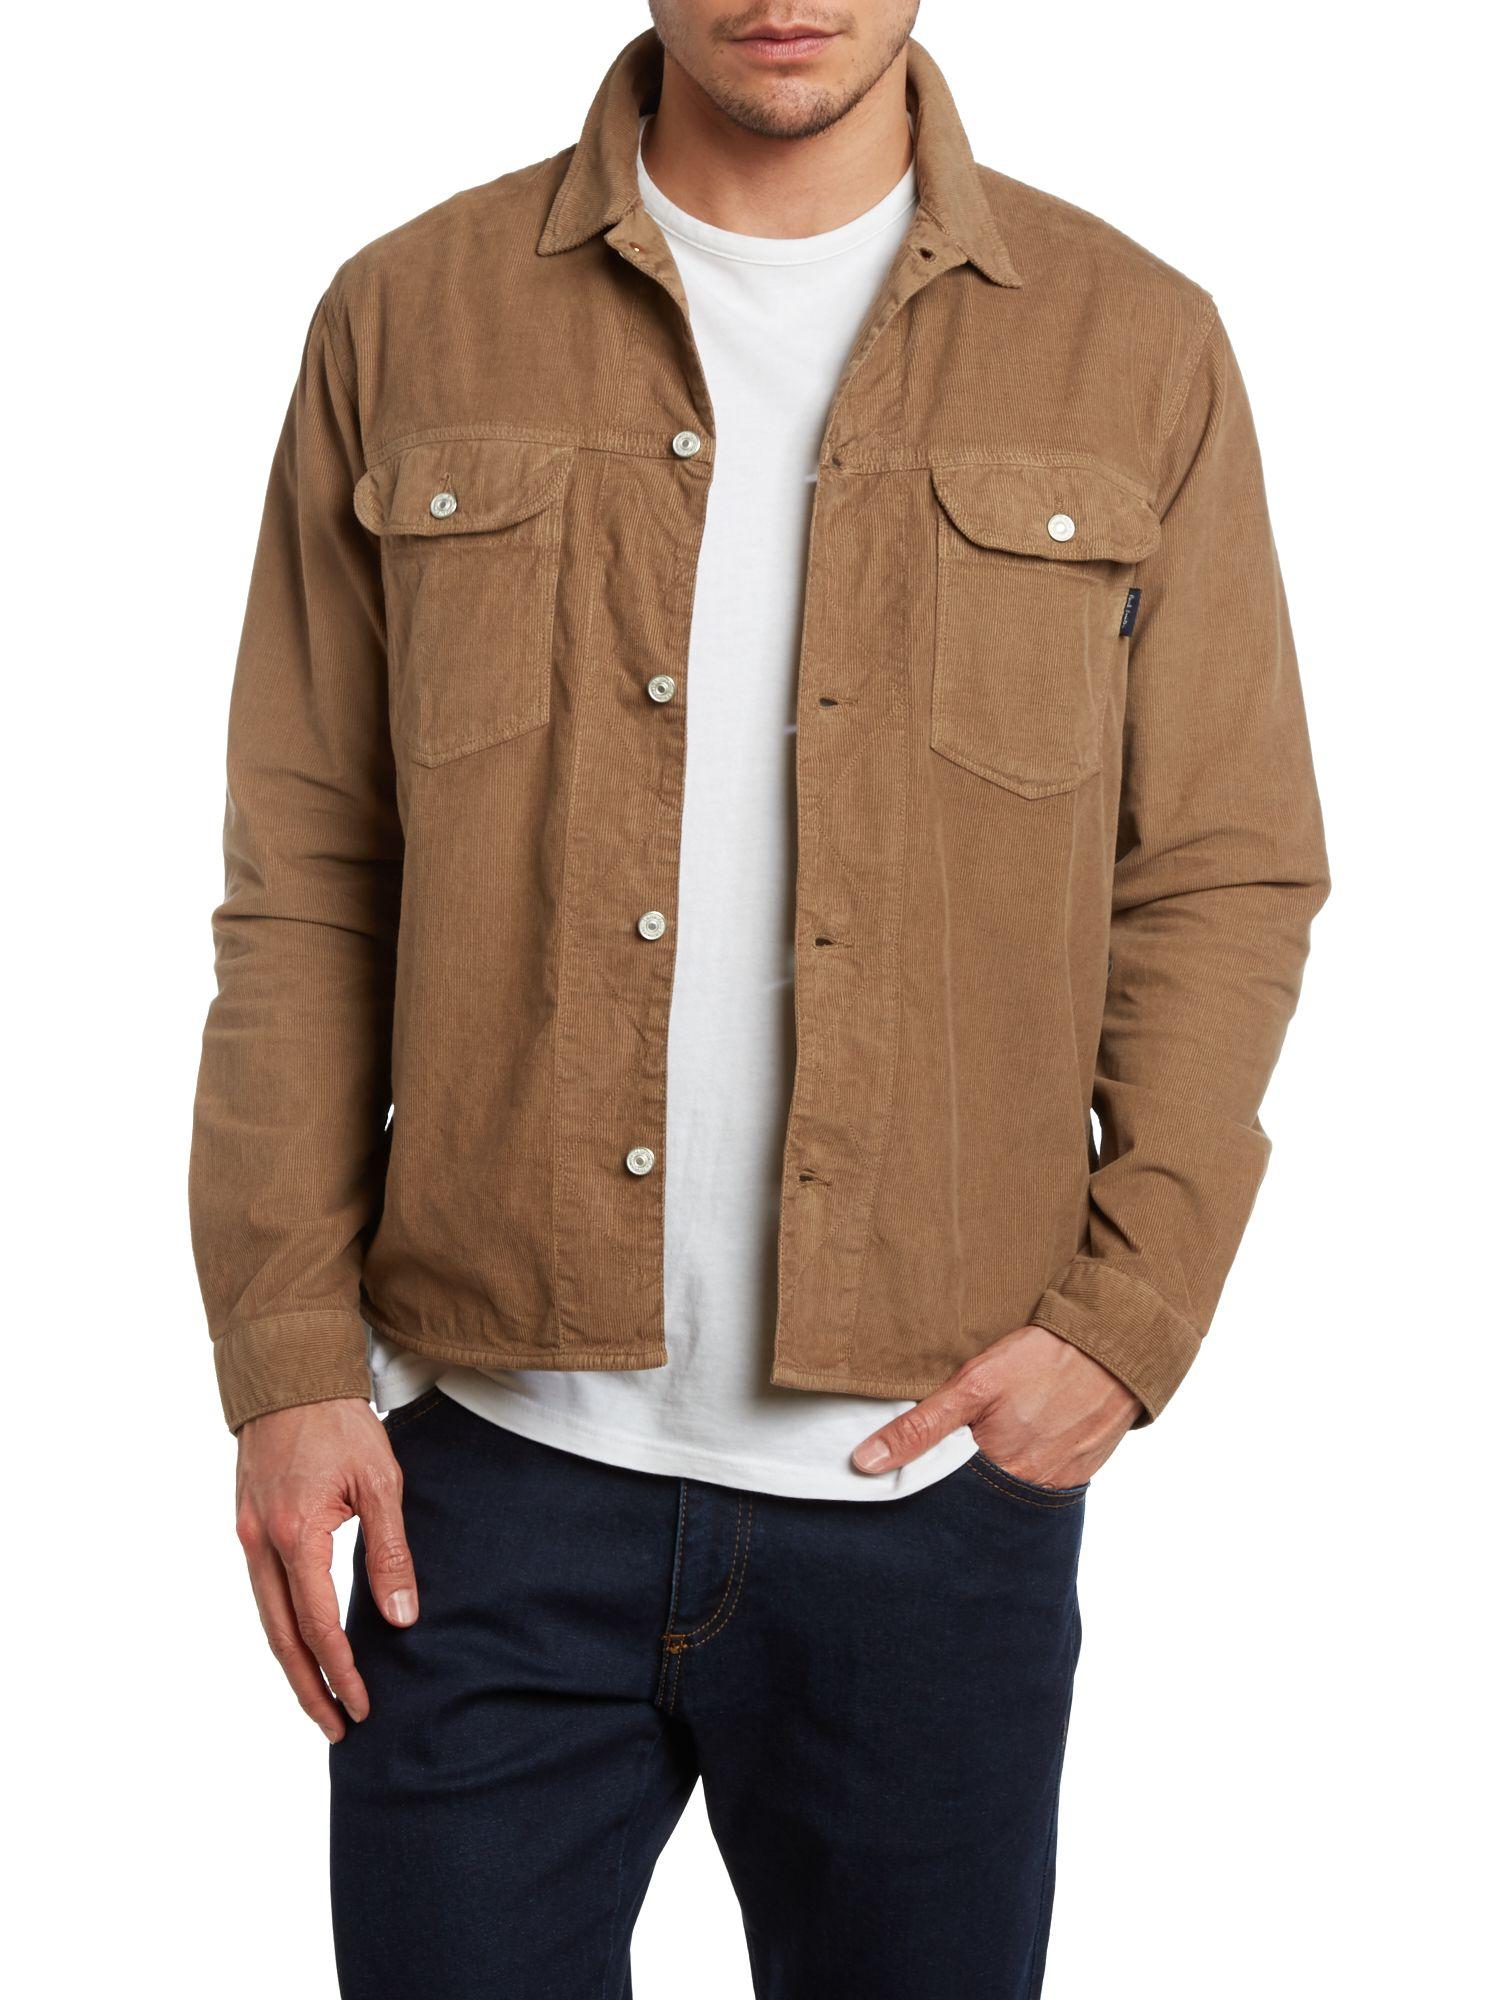 Brown Cord Jacket | Outdoor Jacket